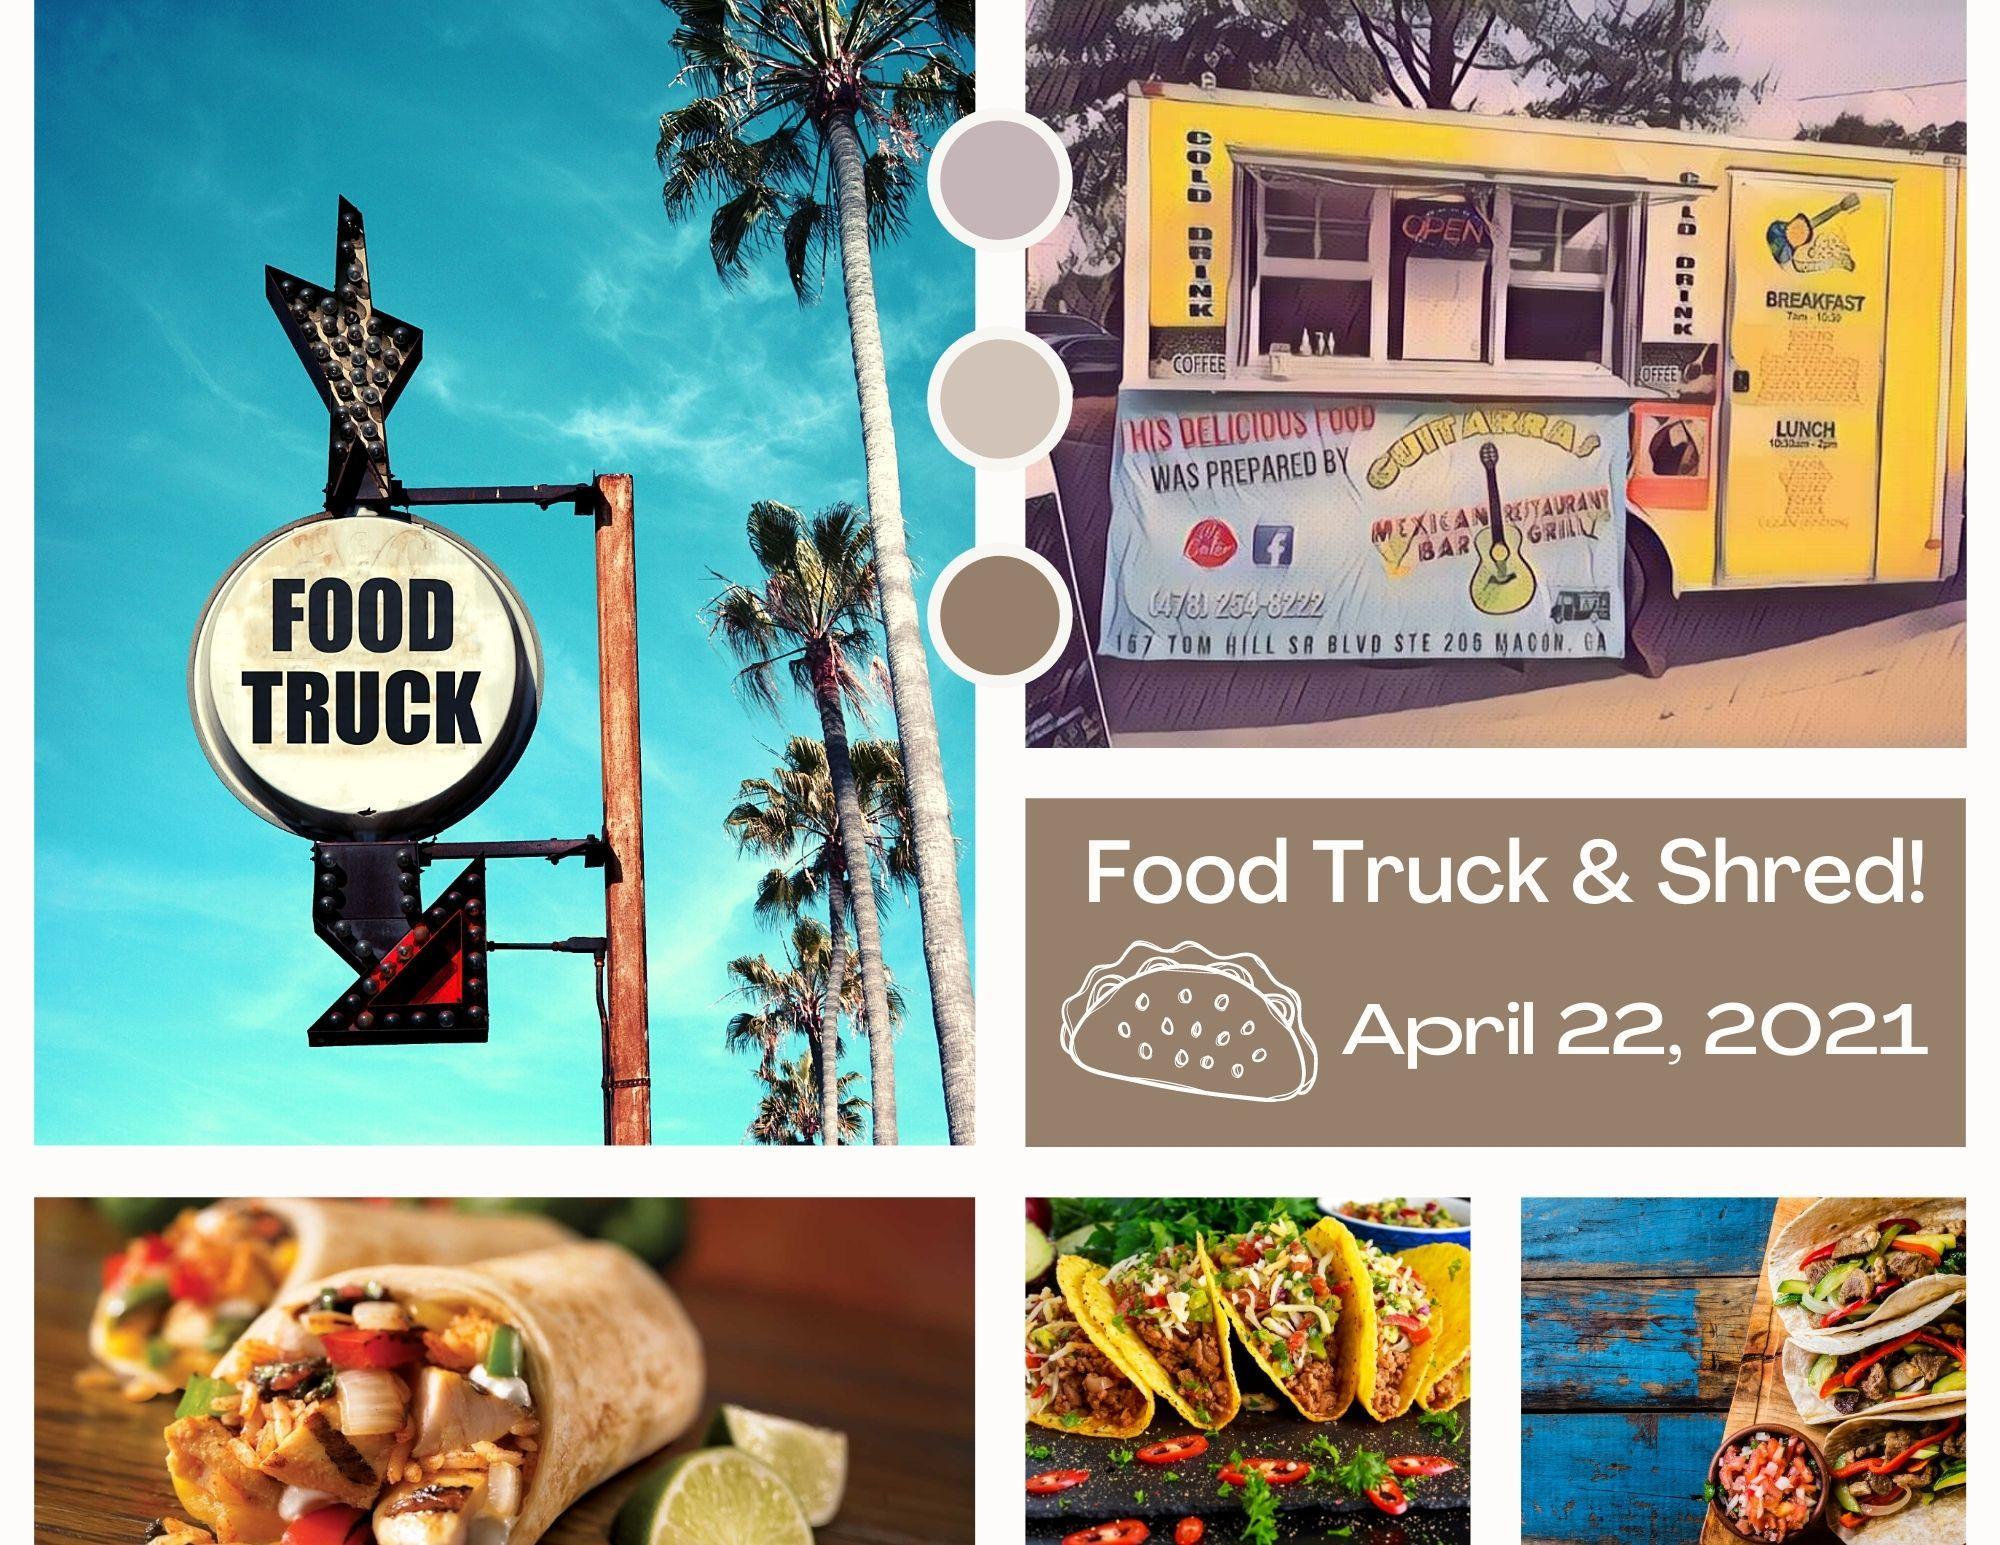 Food Truck & Shred Thumbnail